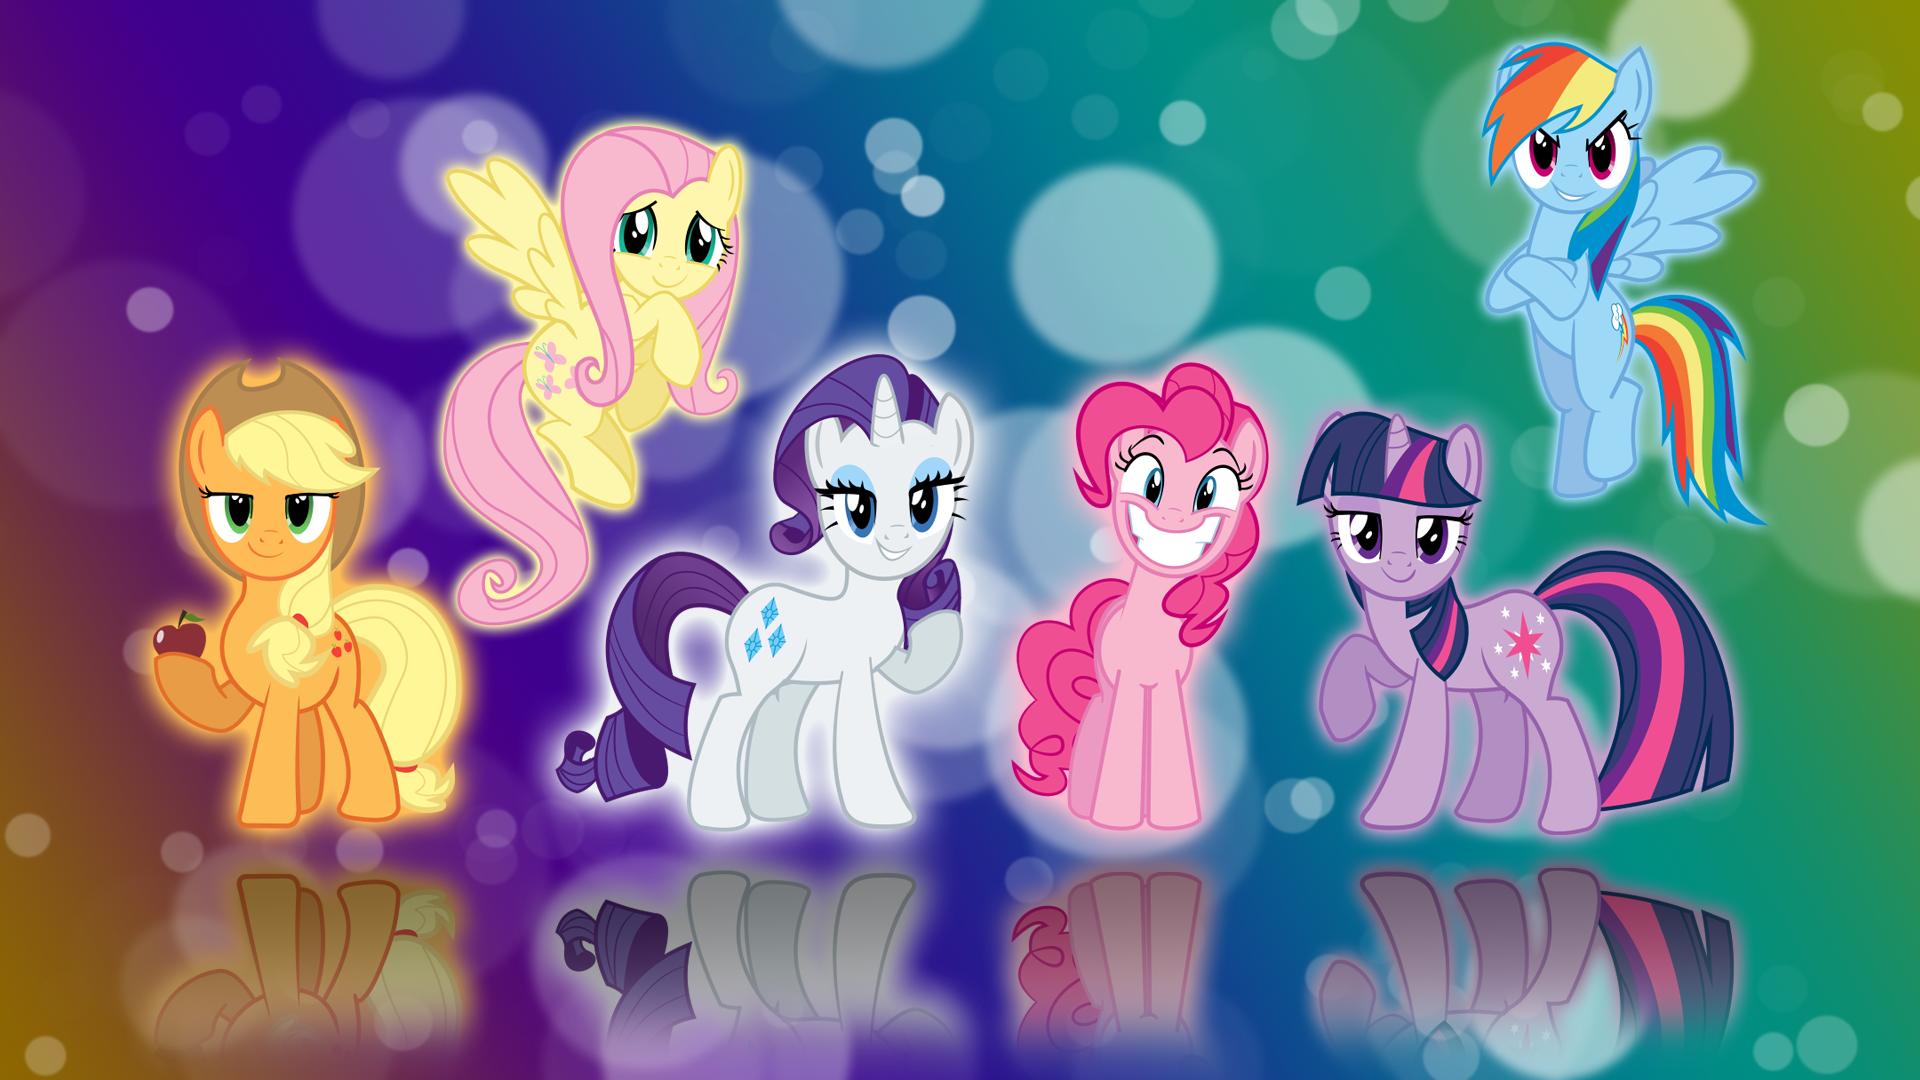 Image - My little pony fim six mane wallpaper by ...